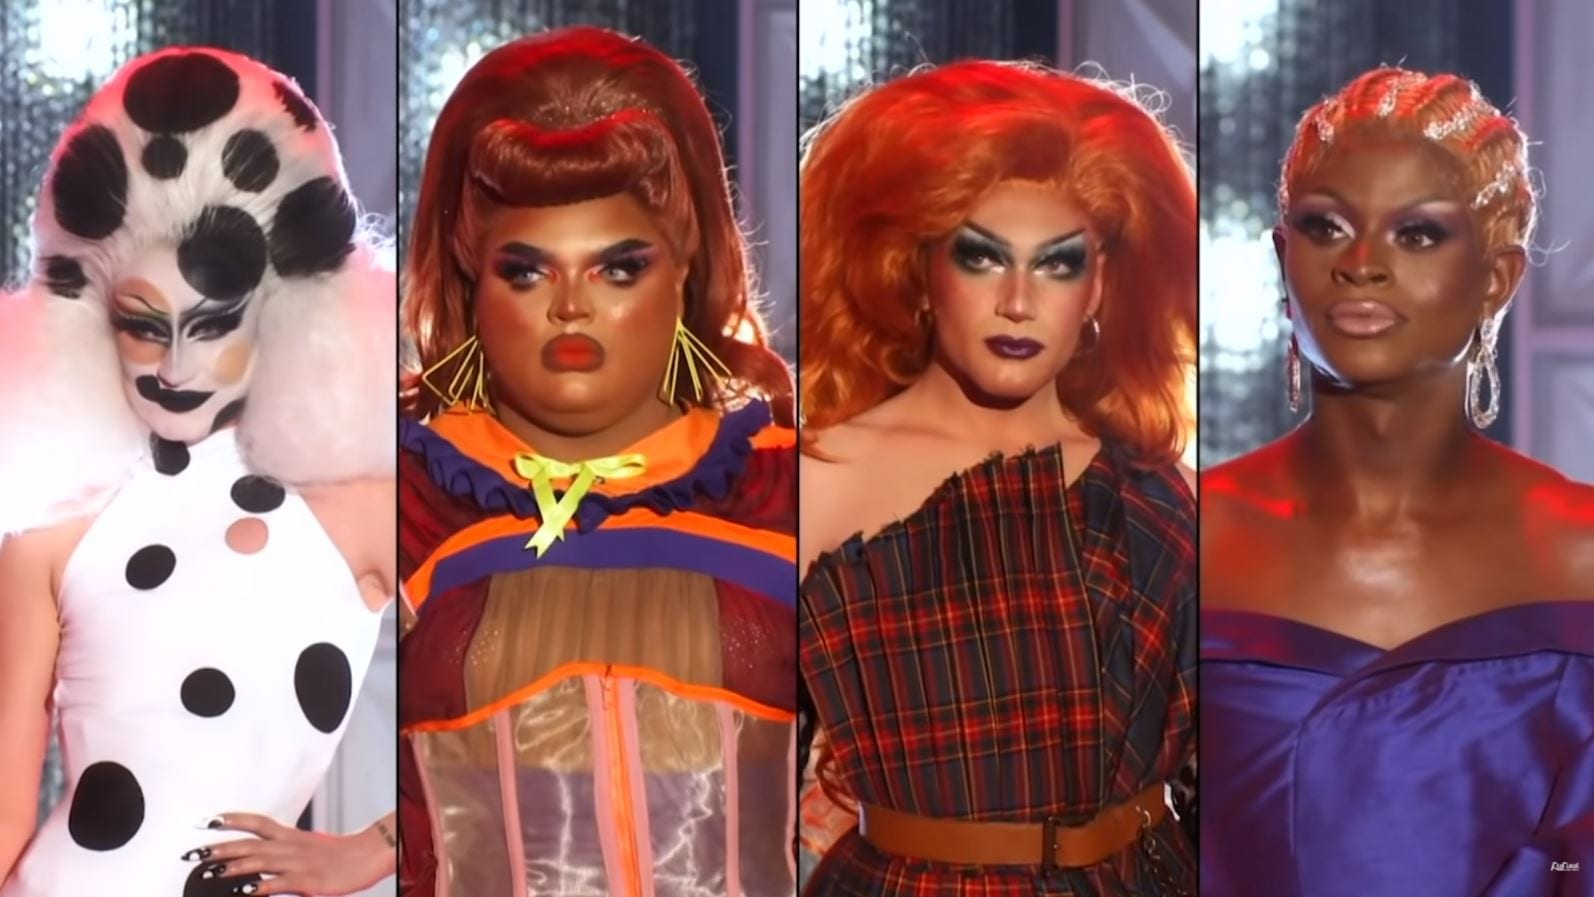 Preview and Recap: RuPaul's Drag Race US Season 13 Final Episode